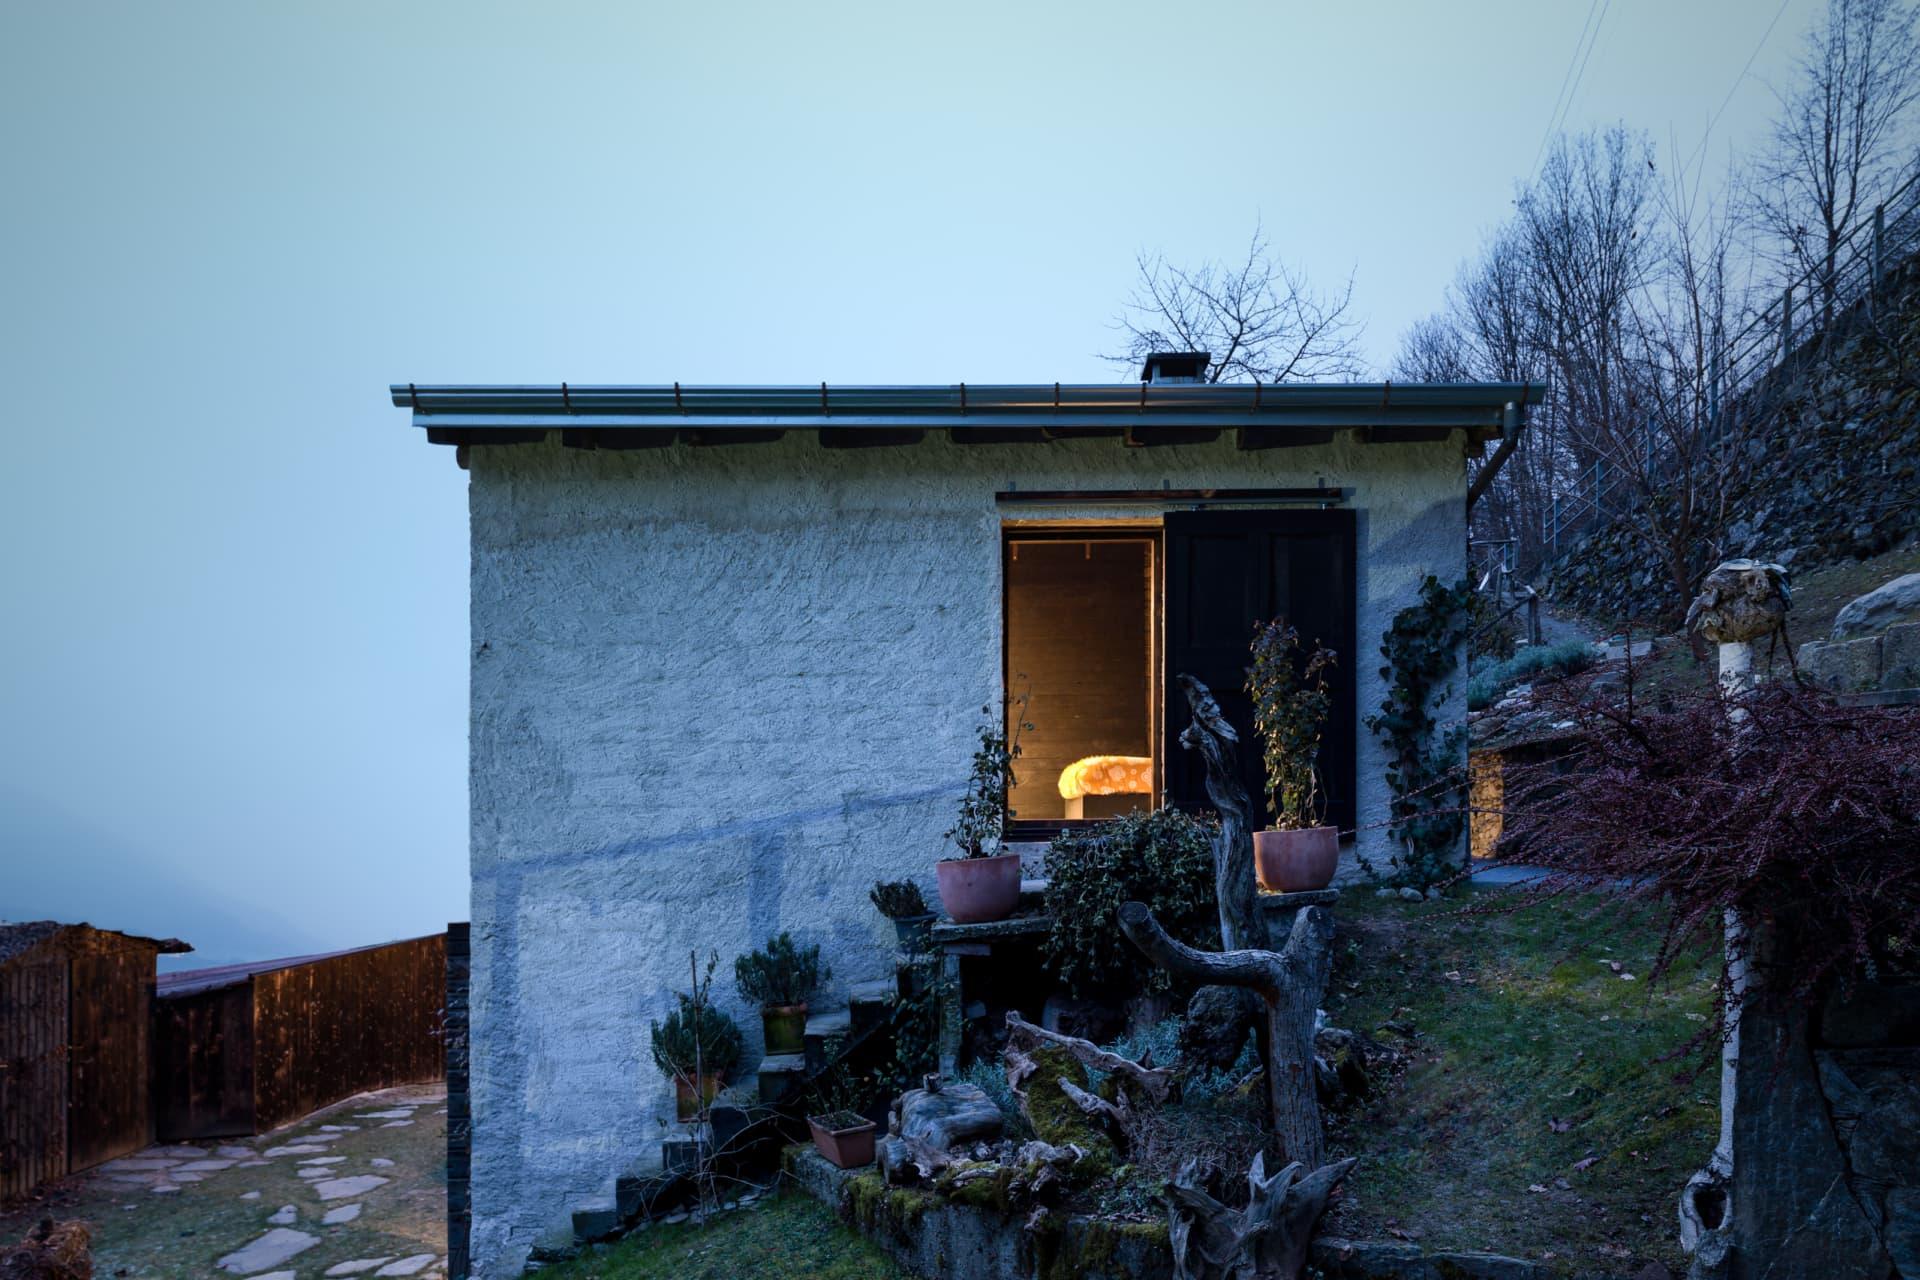 House and garden.